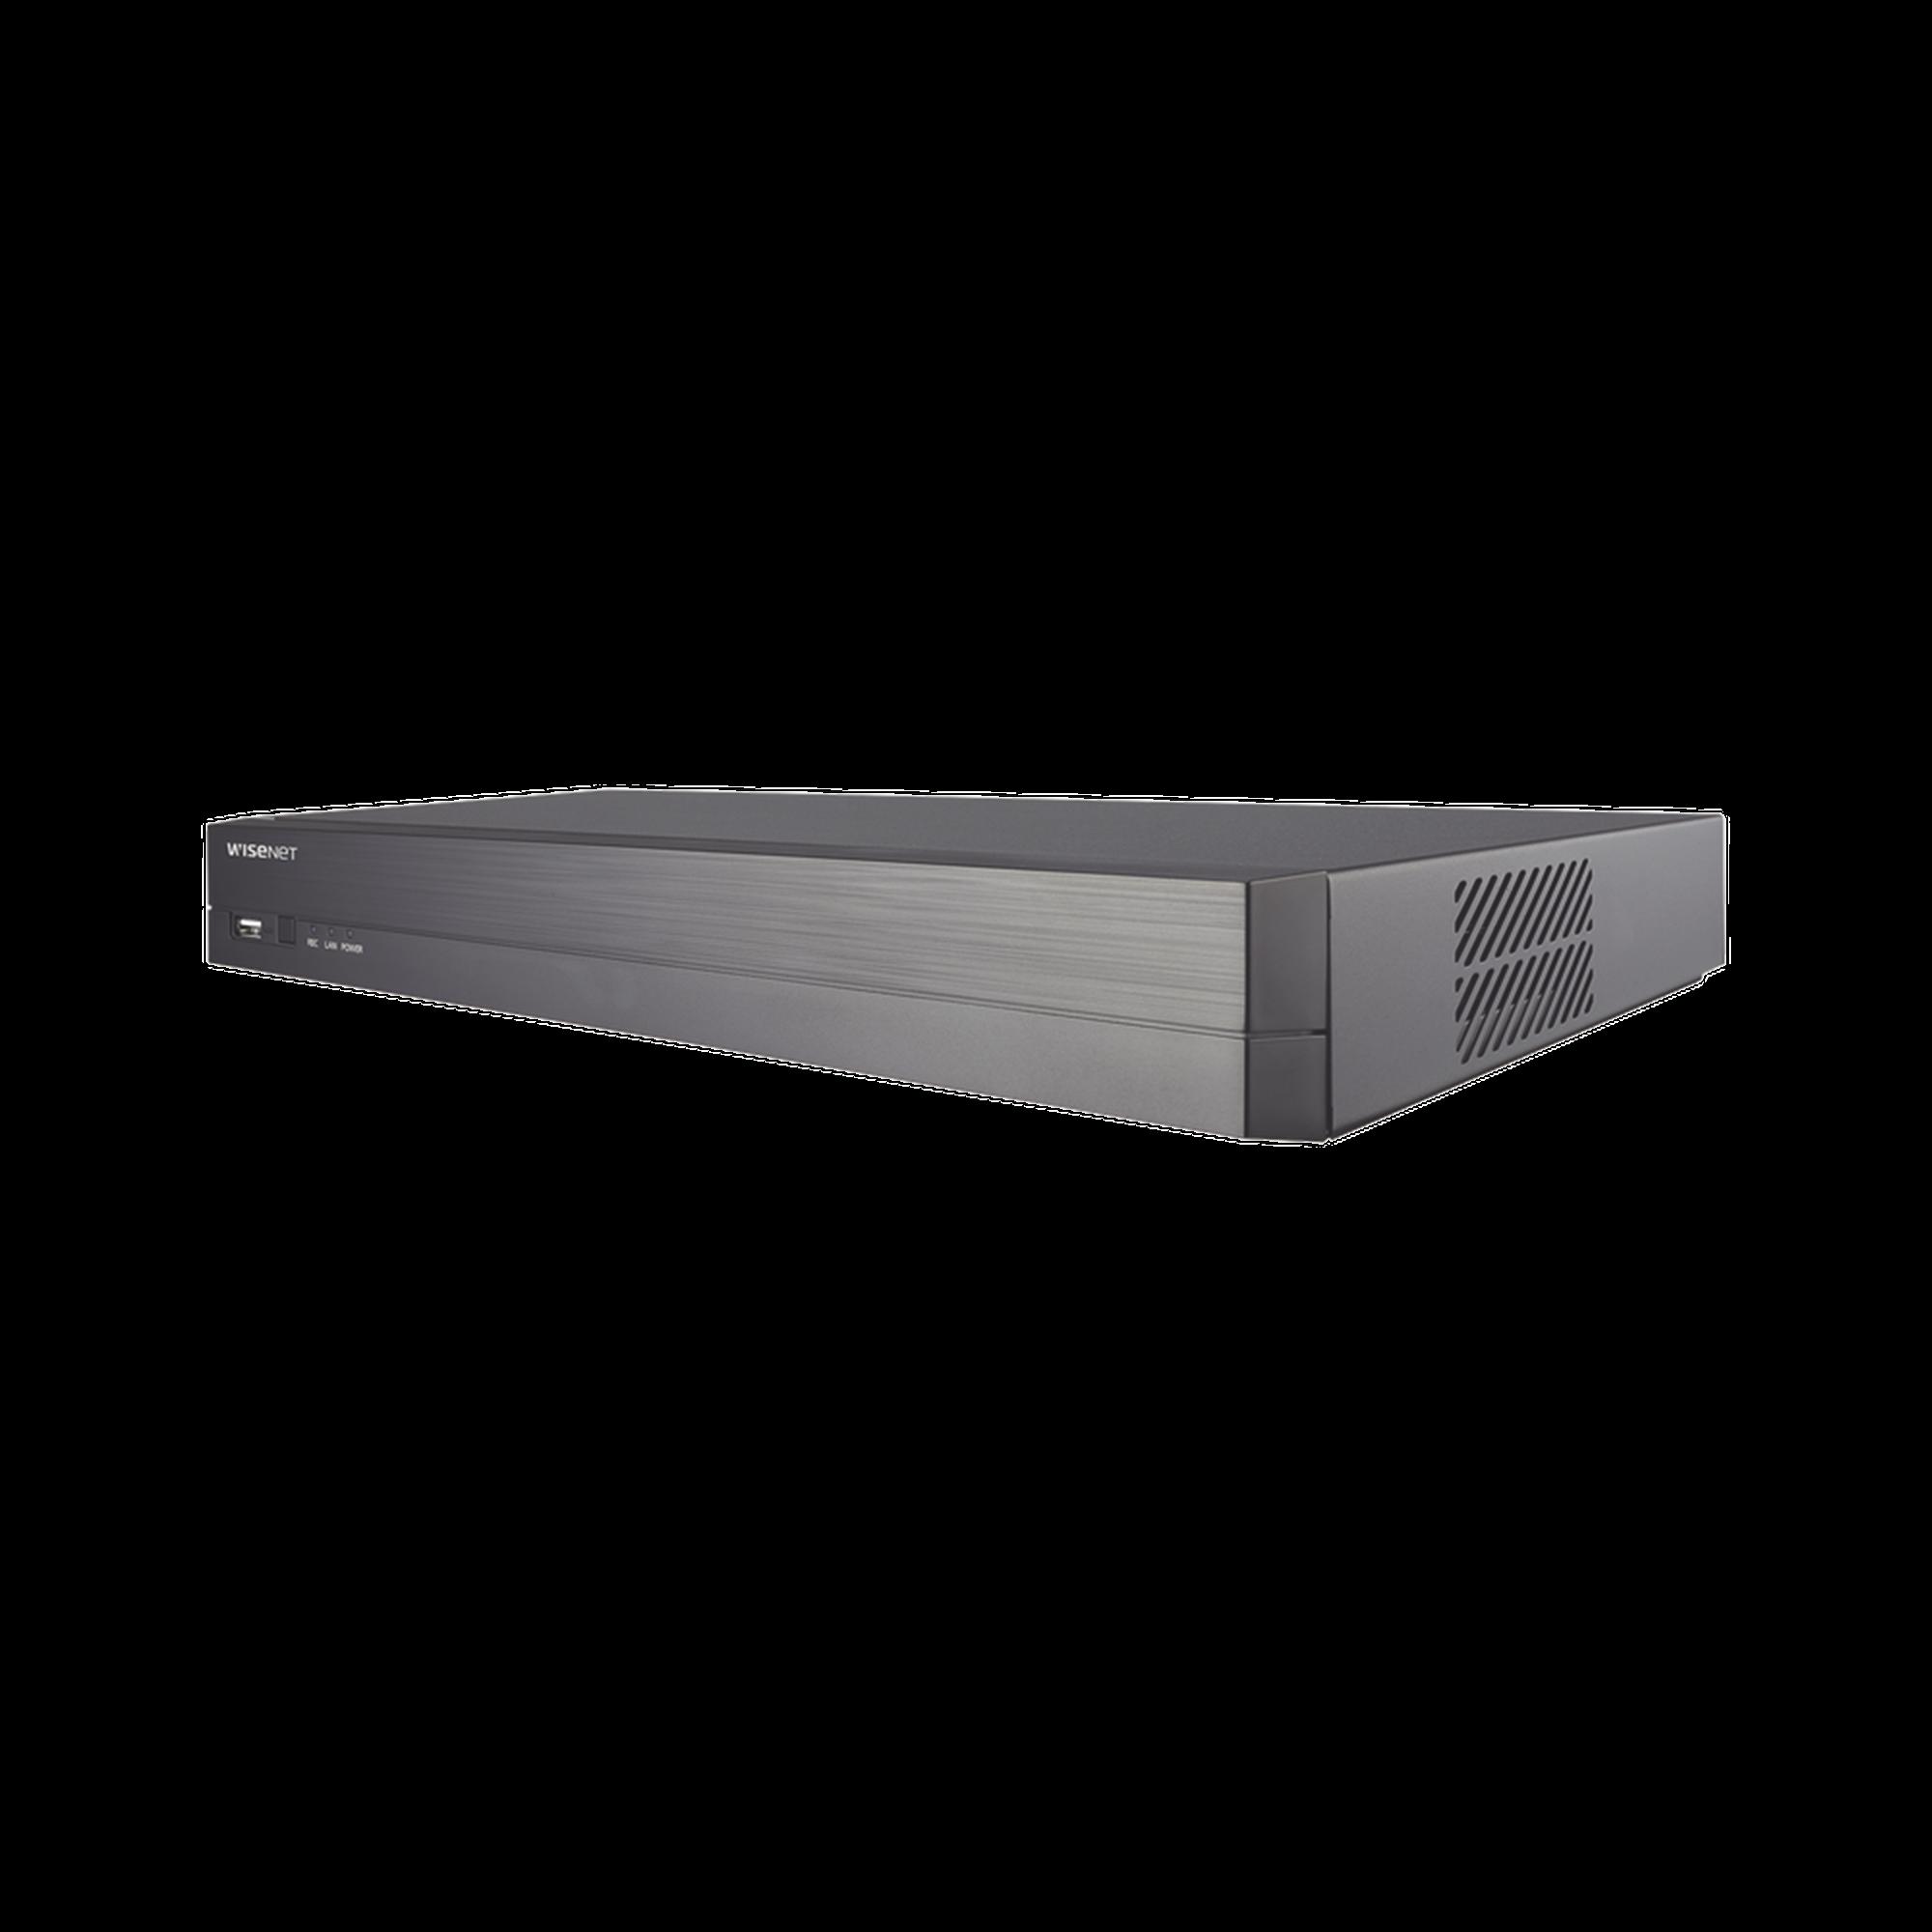 NVR 8 Megapíxel / 4 canales / H.265 / P2P Wisenet / 4 puertos PoE / Incluye 1Tb